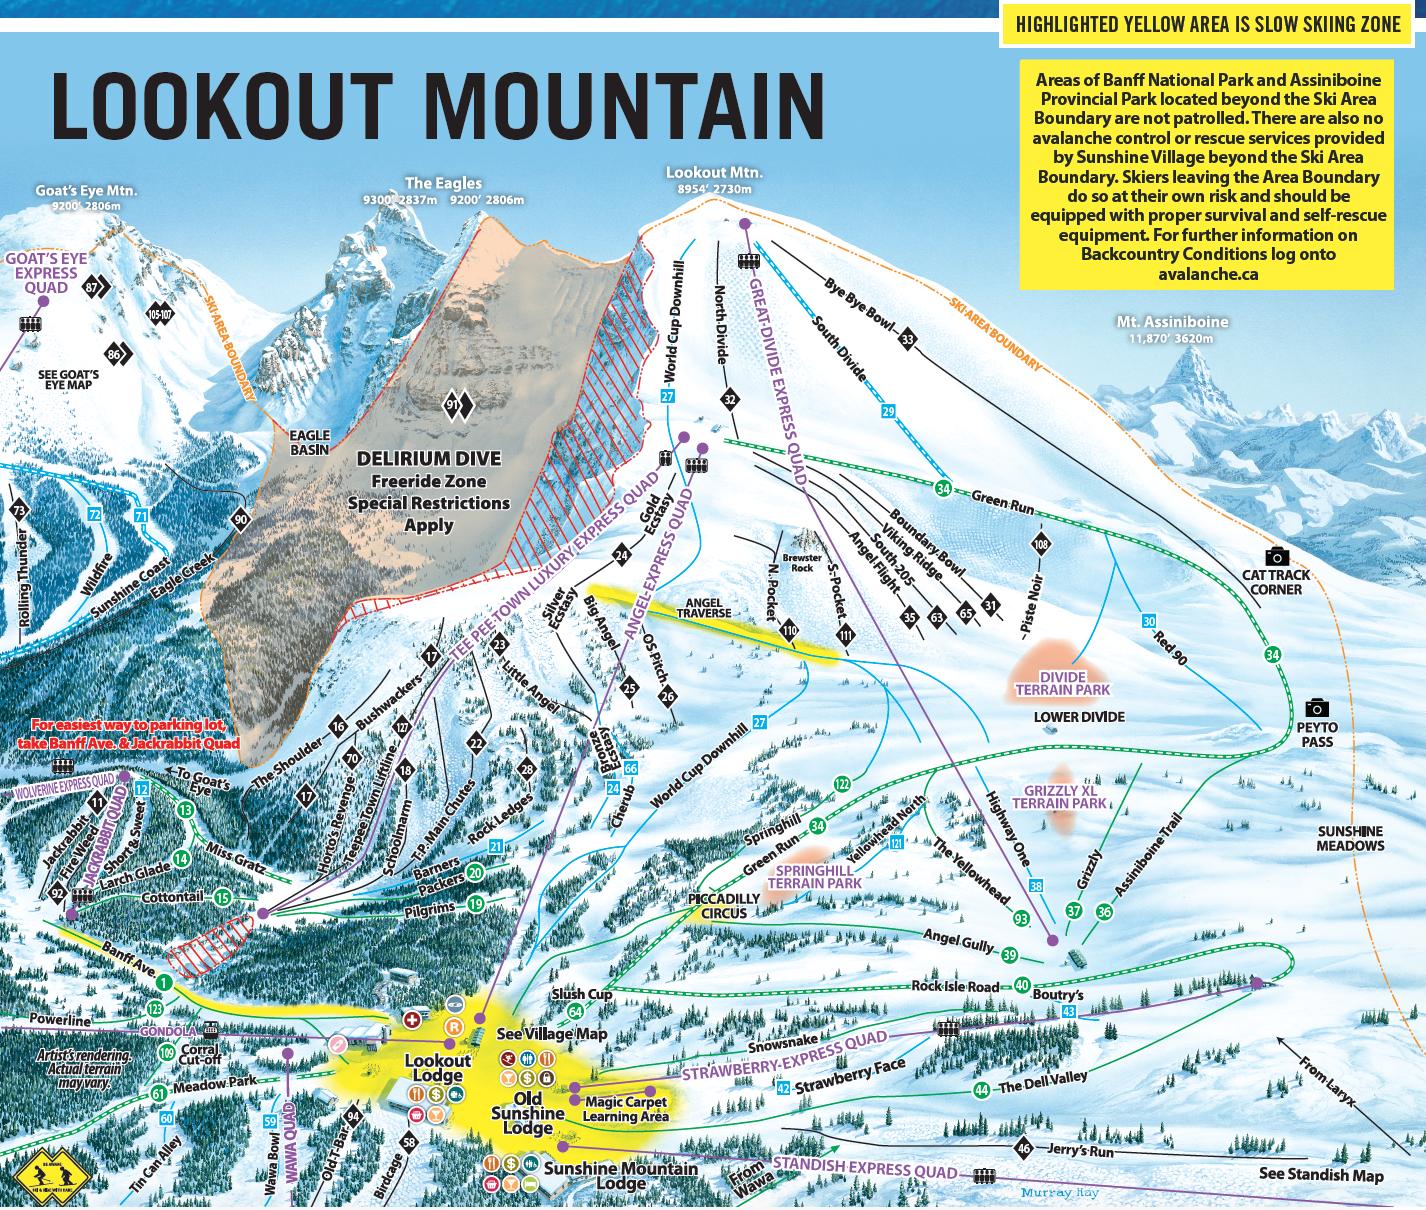 Western us ski resorts map the 11 best ski resorts in canada updated 201819 snowpak publicscrutiny Gallery